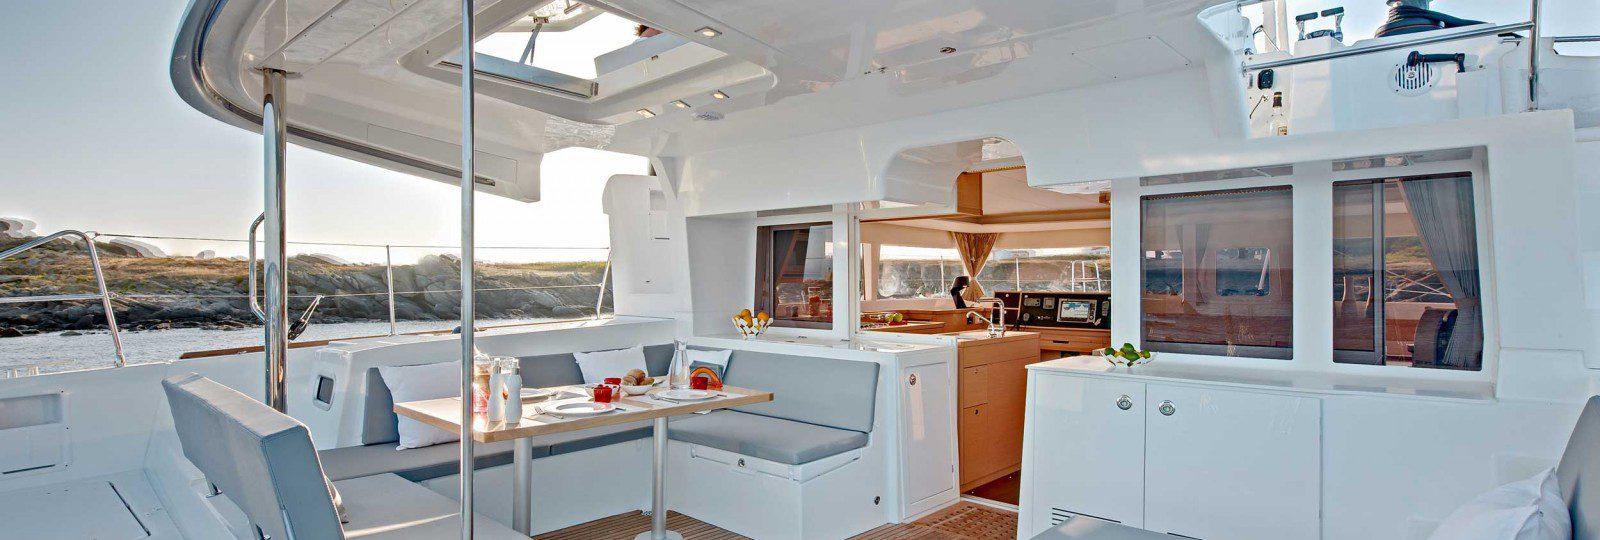 Lagoon 450f cockpit